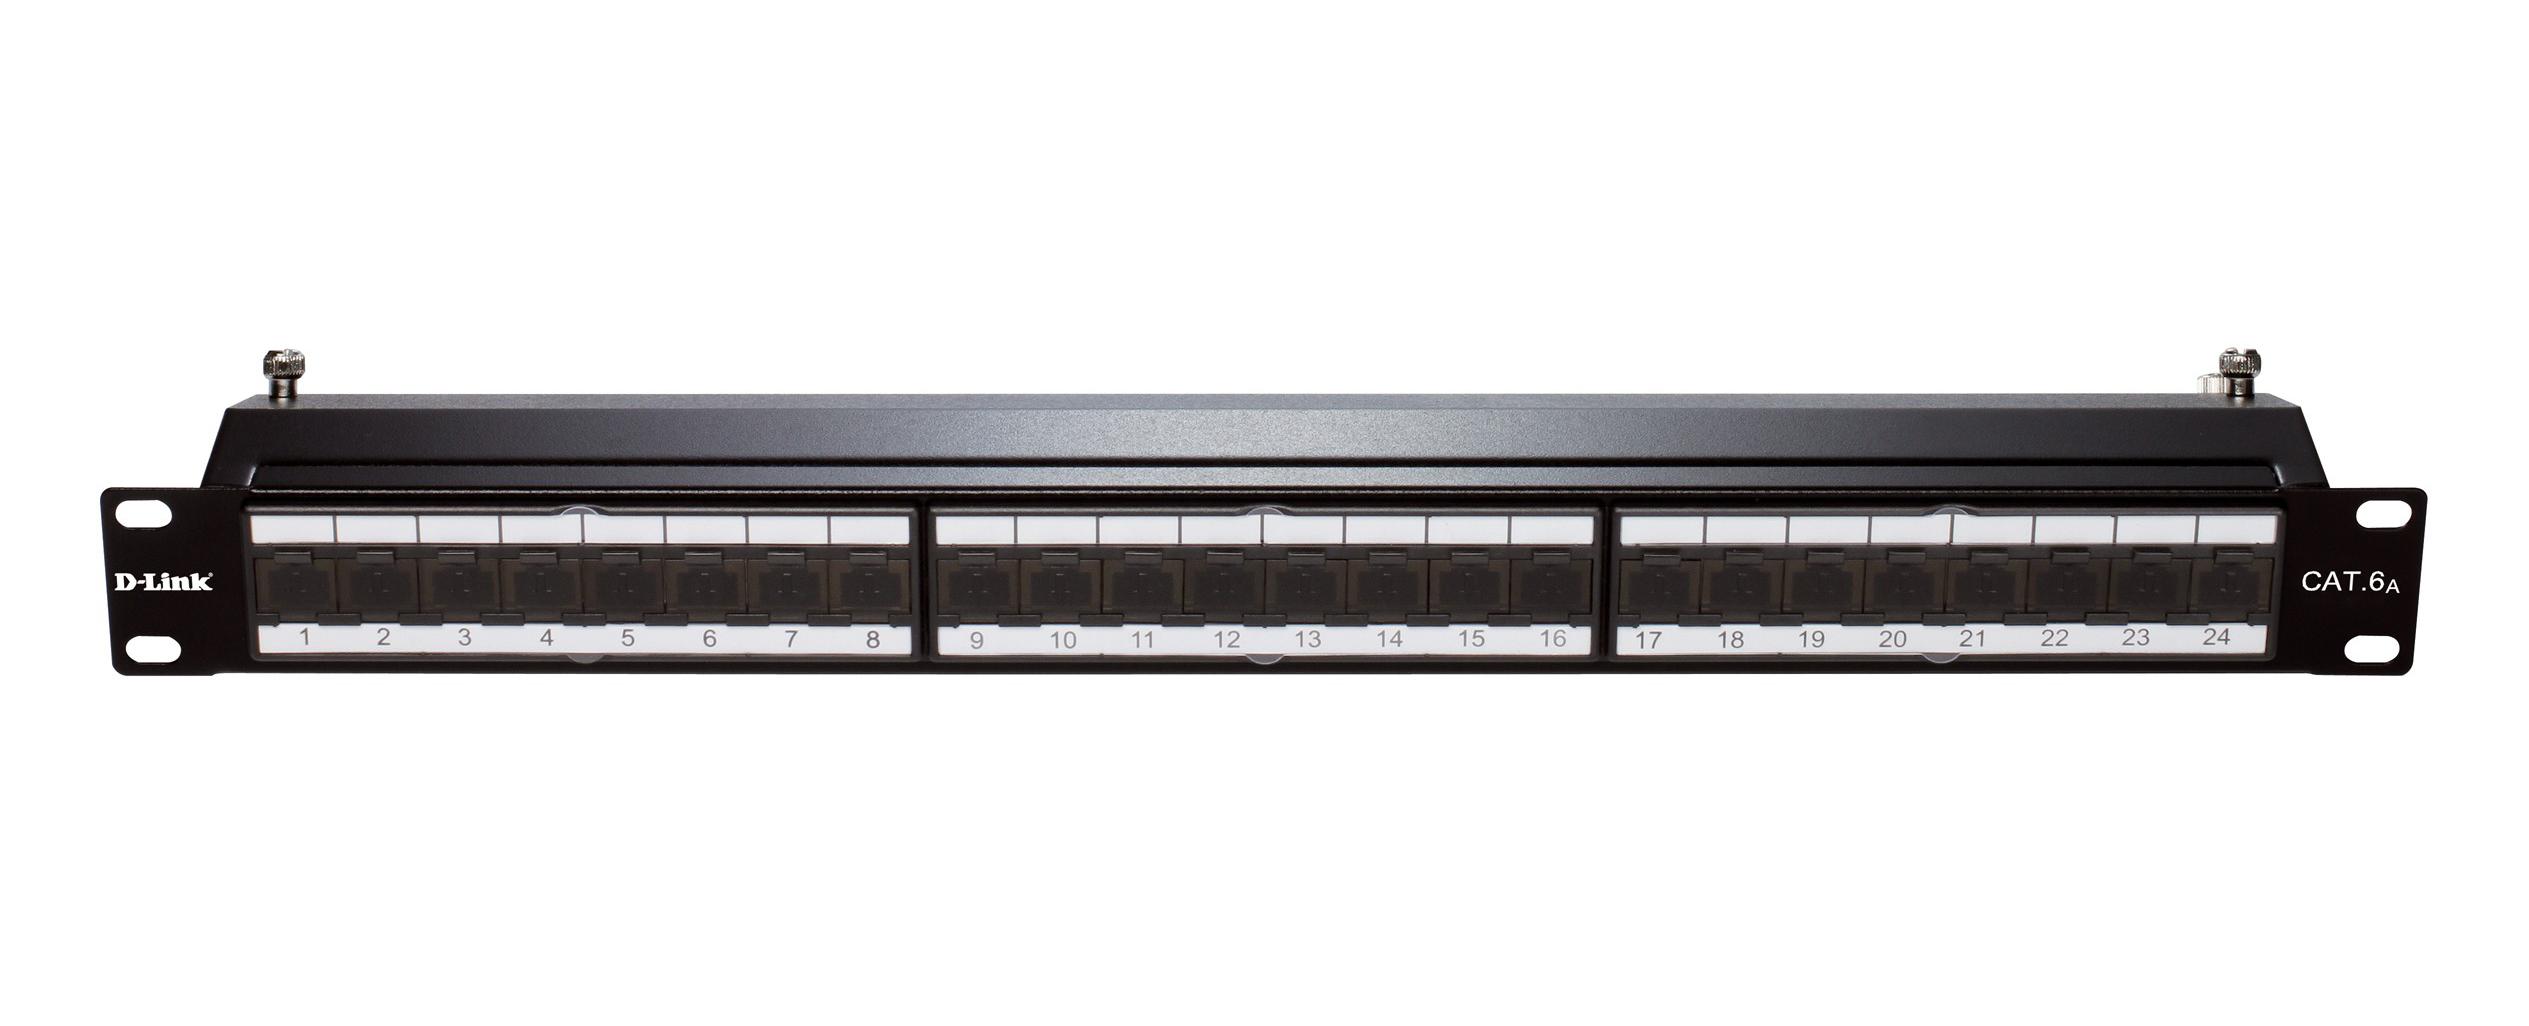 D Link Unshielded 48 Port Full Loaded Patch Panel Help Tech Co Ltd 24 Cat 6 Cable Wiring 6a Shielded Keystone